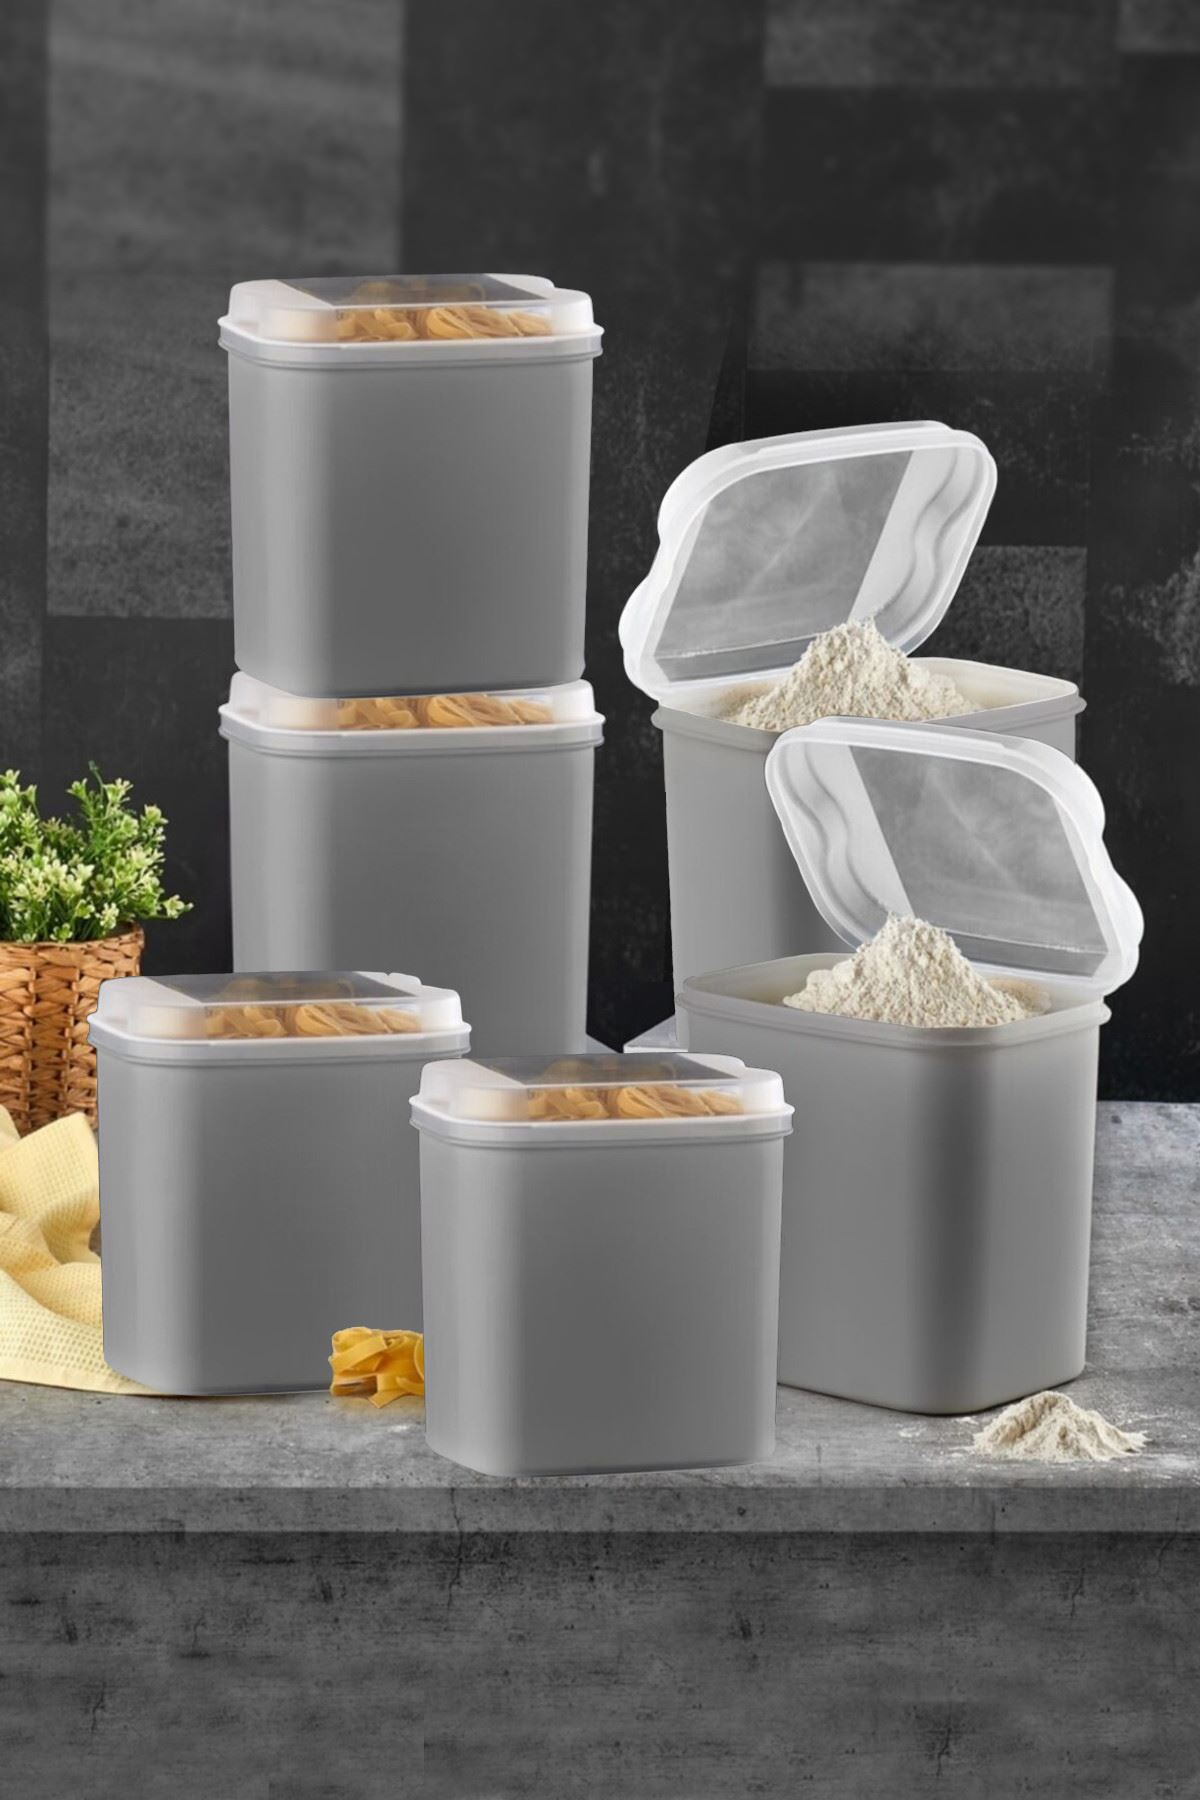 Kitchen Trend 6 LI Un ve Bakliyat Kabı 4,5 Litre Gri